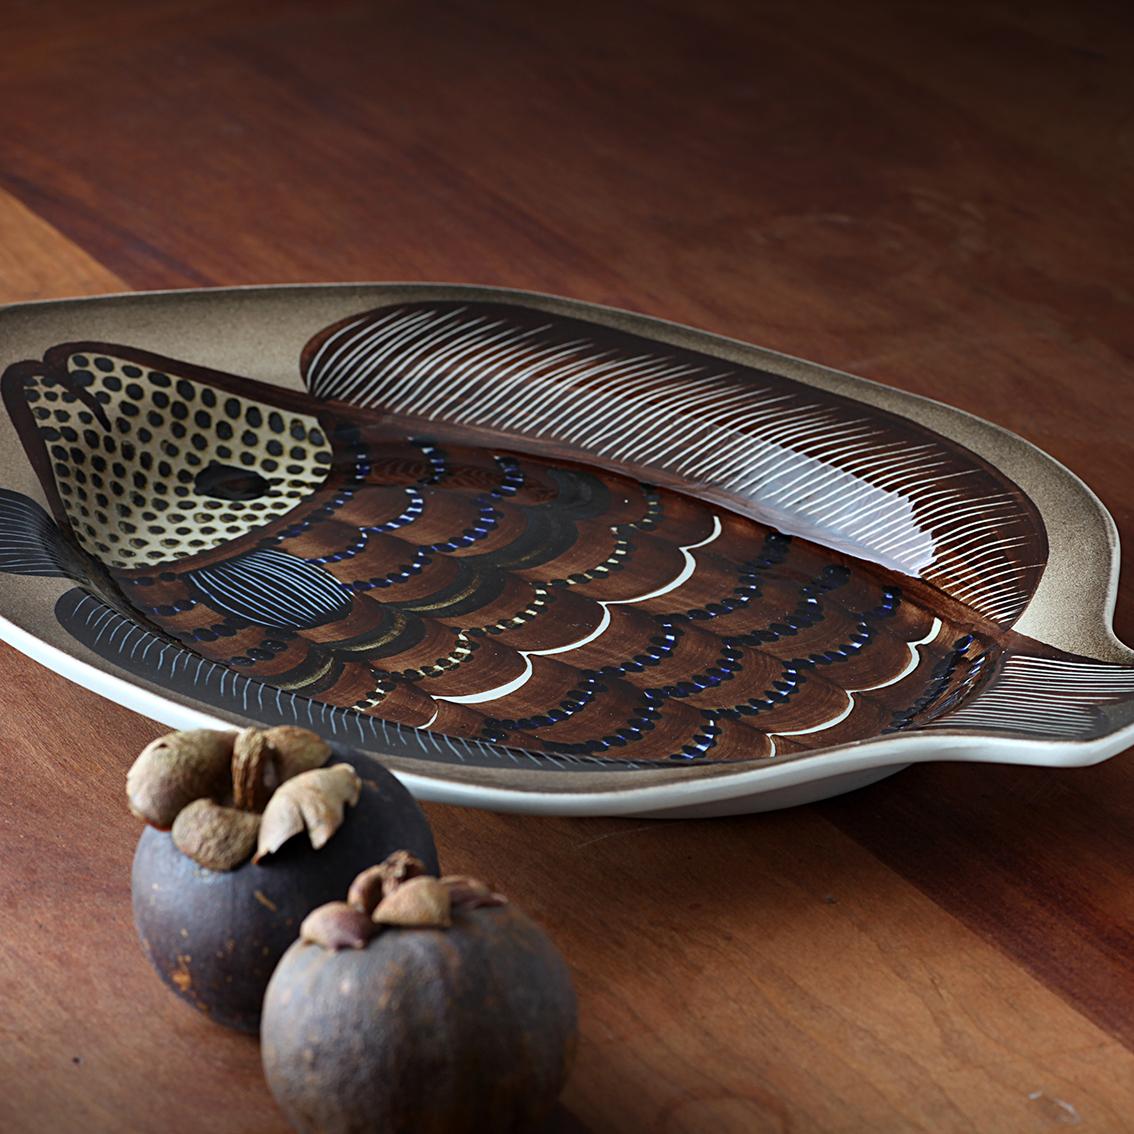 ARABIA アラビア グンヴァル オリン グランクヴィスト 魚の絵の皿 北欧ヴィンテージ